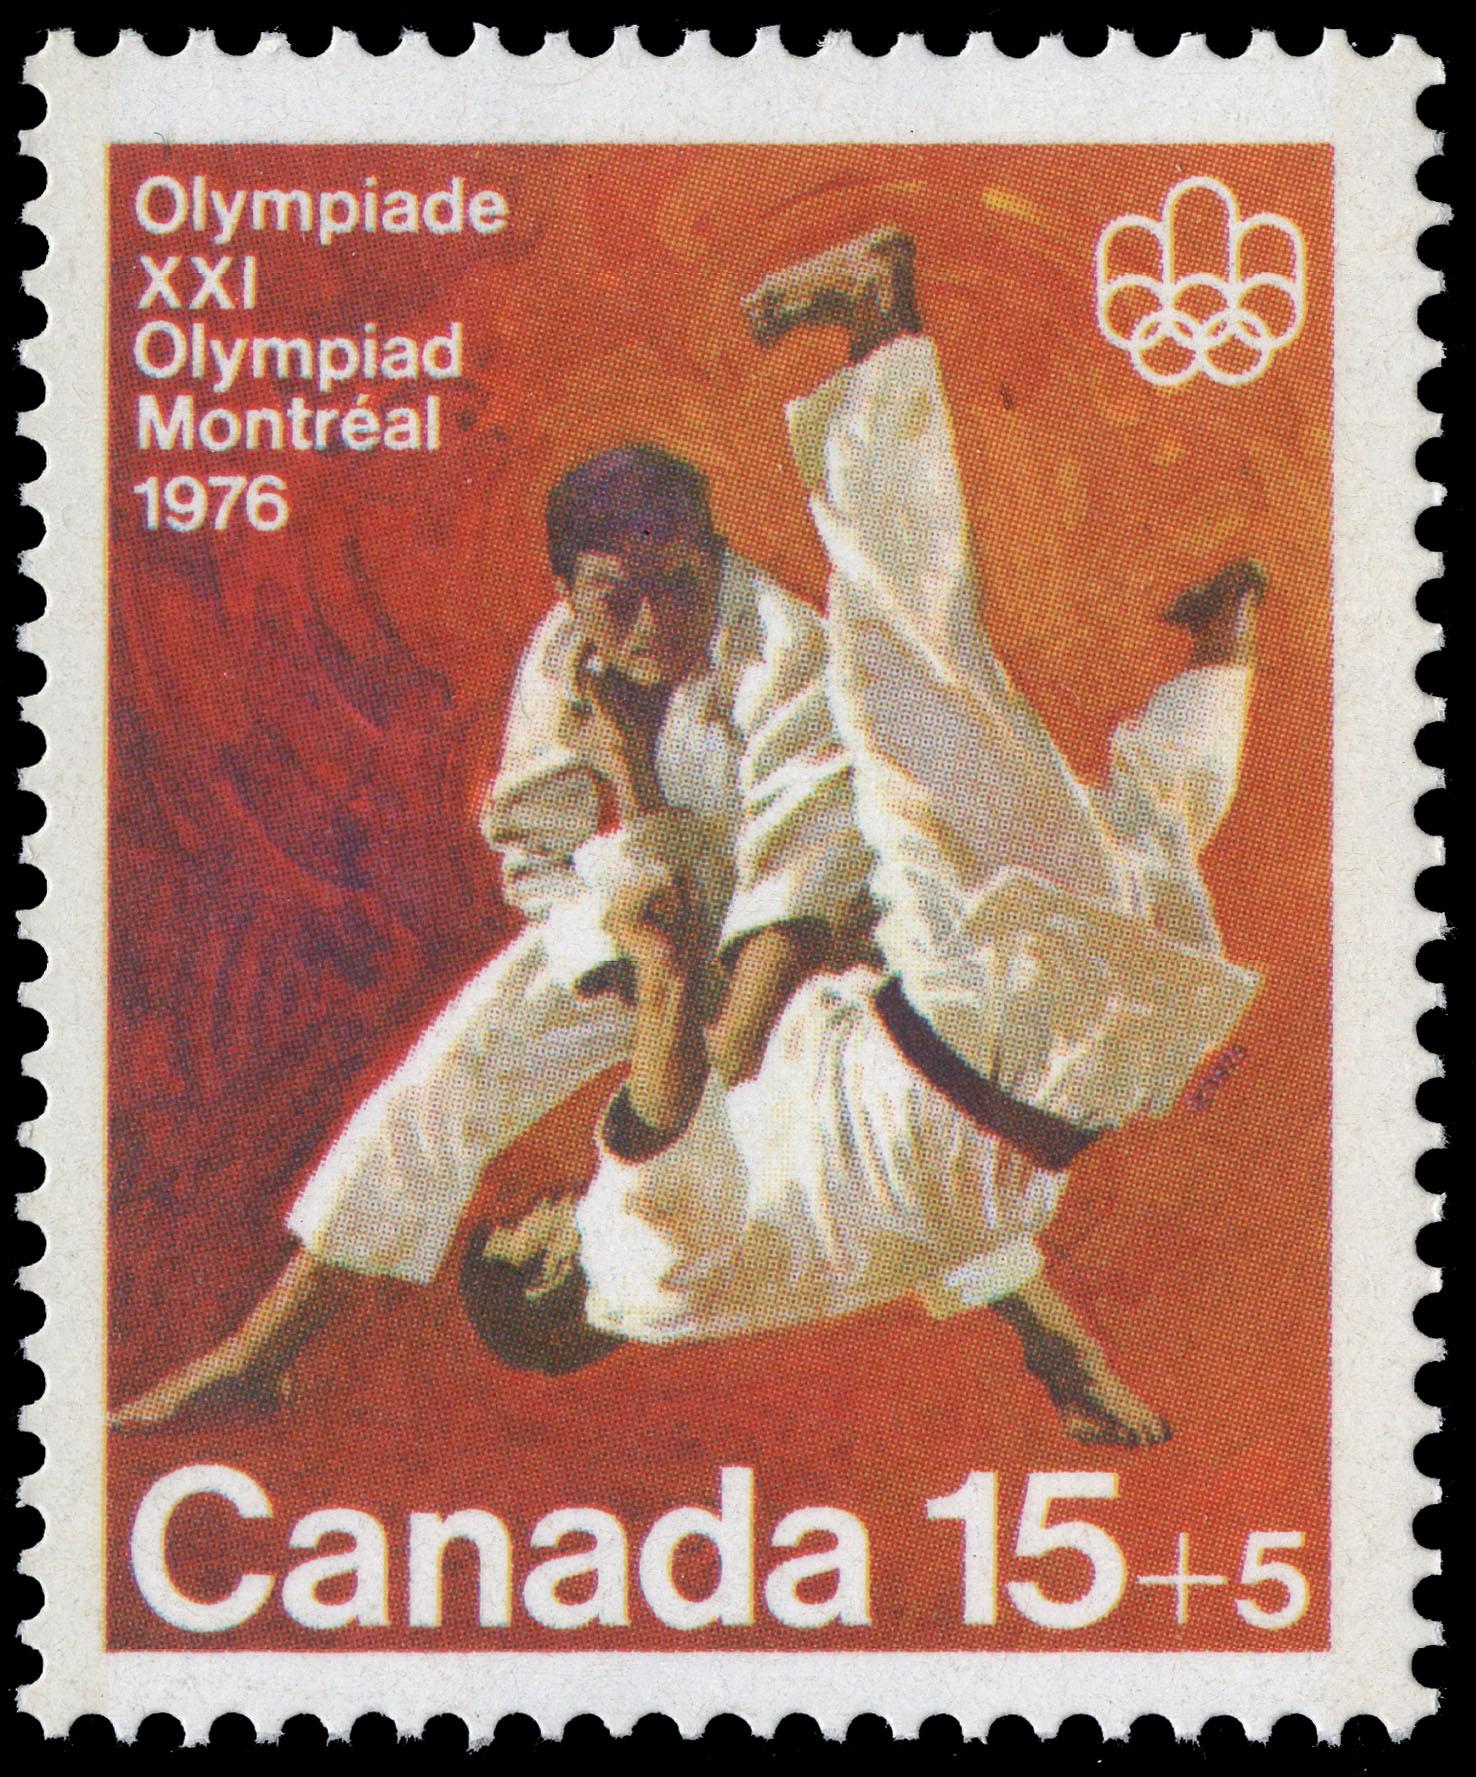 Judo Canada Postage Stamp